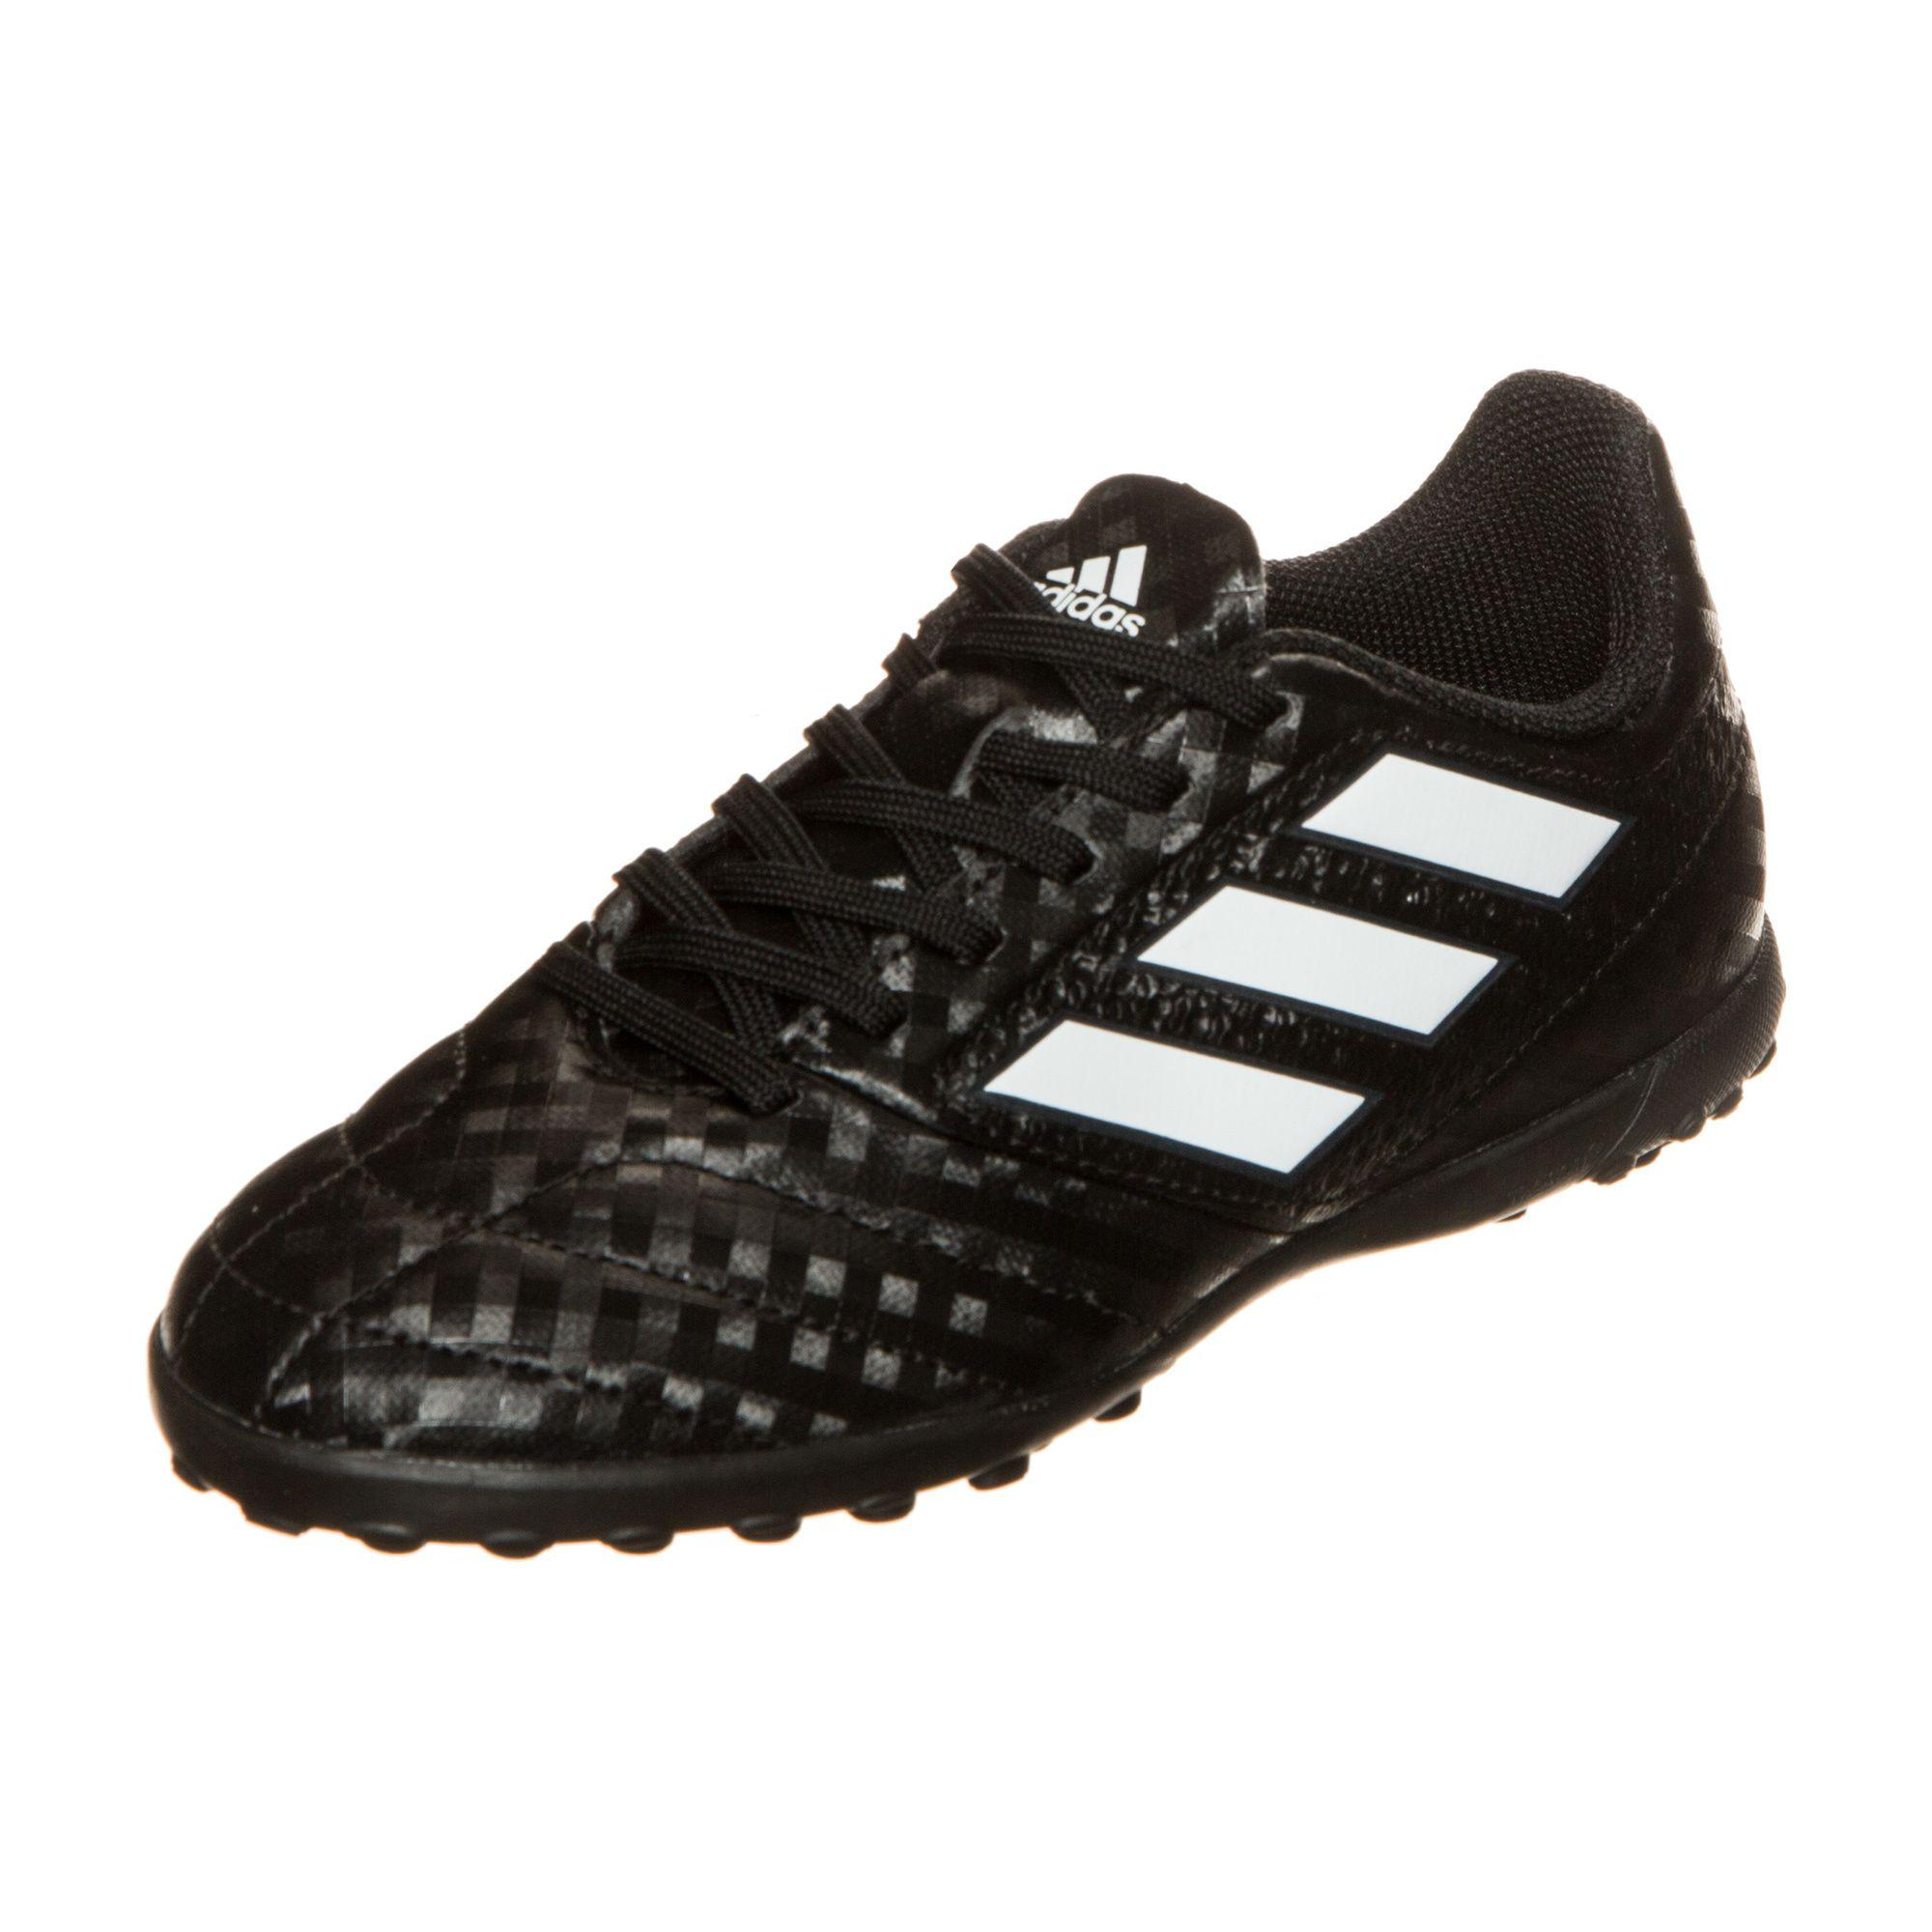 ADIDAS PERFORMANCE adidas Performance ACE 17.4 Chequered Black TF Fußballschuh Kinder